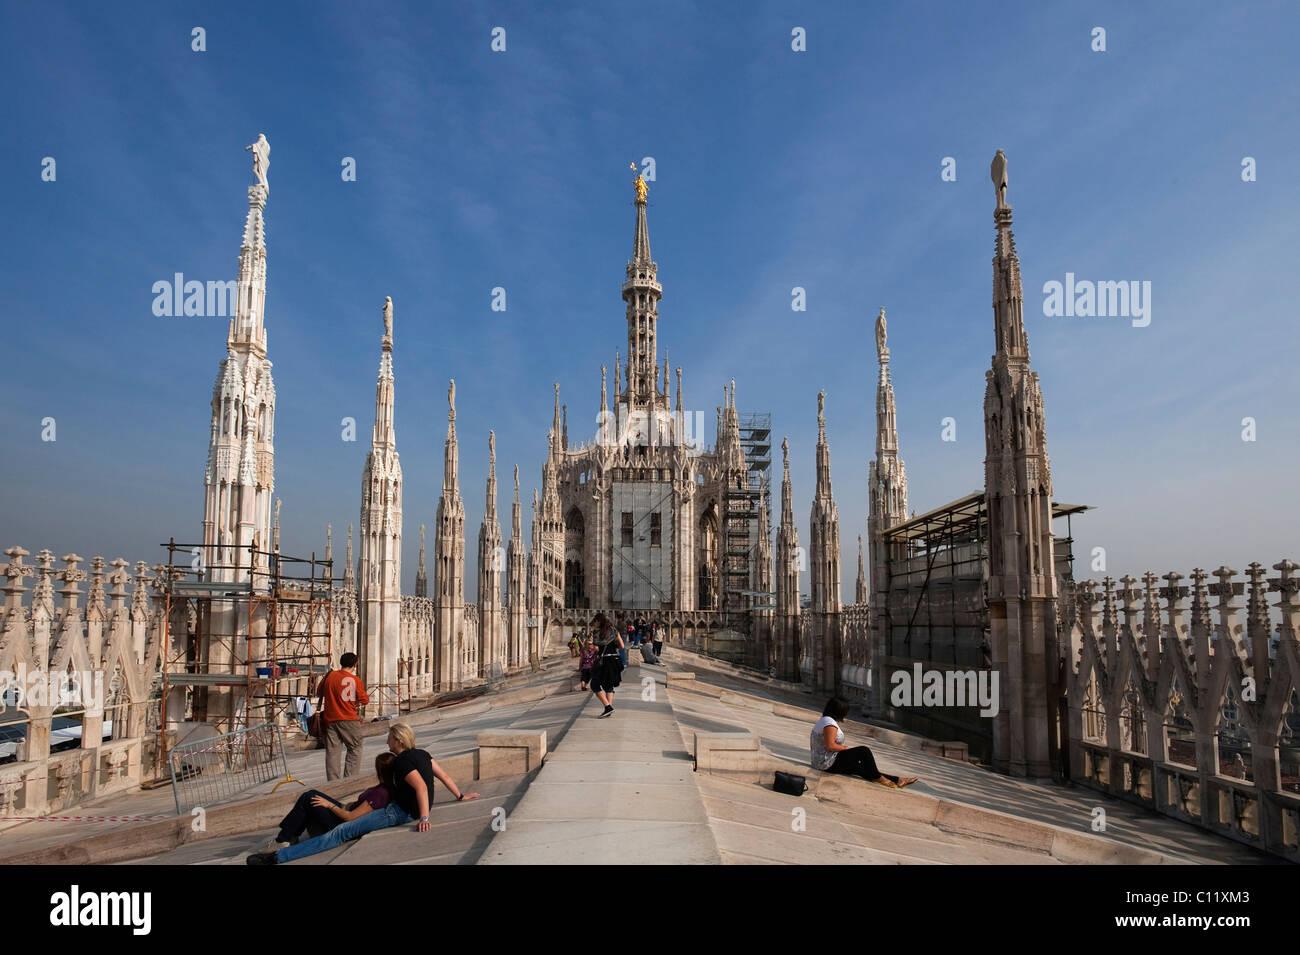 Duomo di Milano, Milan Cathedral, Milan, Lombardy, Italy, Europe - Stock Image